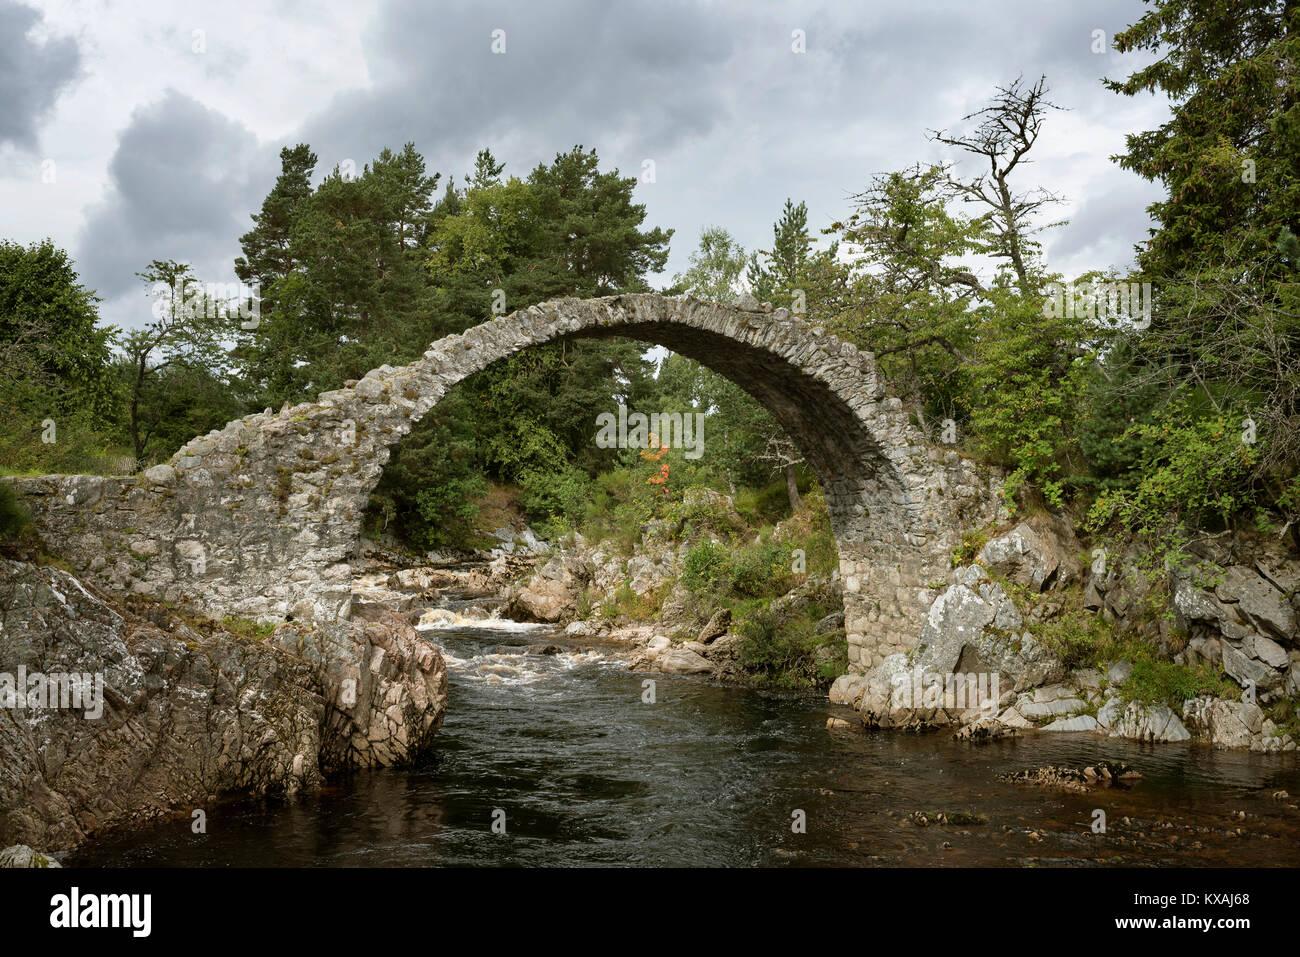 Old stone bridge, built in 1717, Highlands, Carrbridge, Cairngorms National Park, Scotland, Great Britain - Stock Image